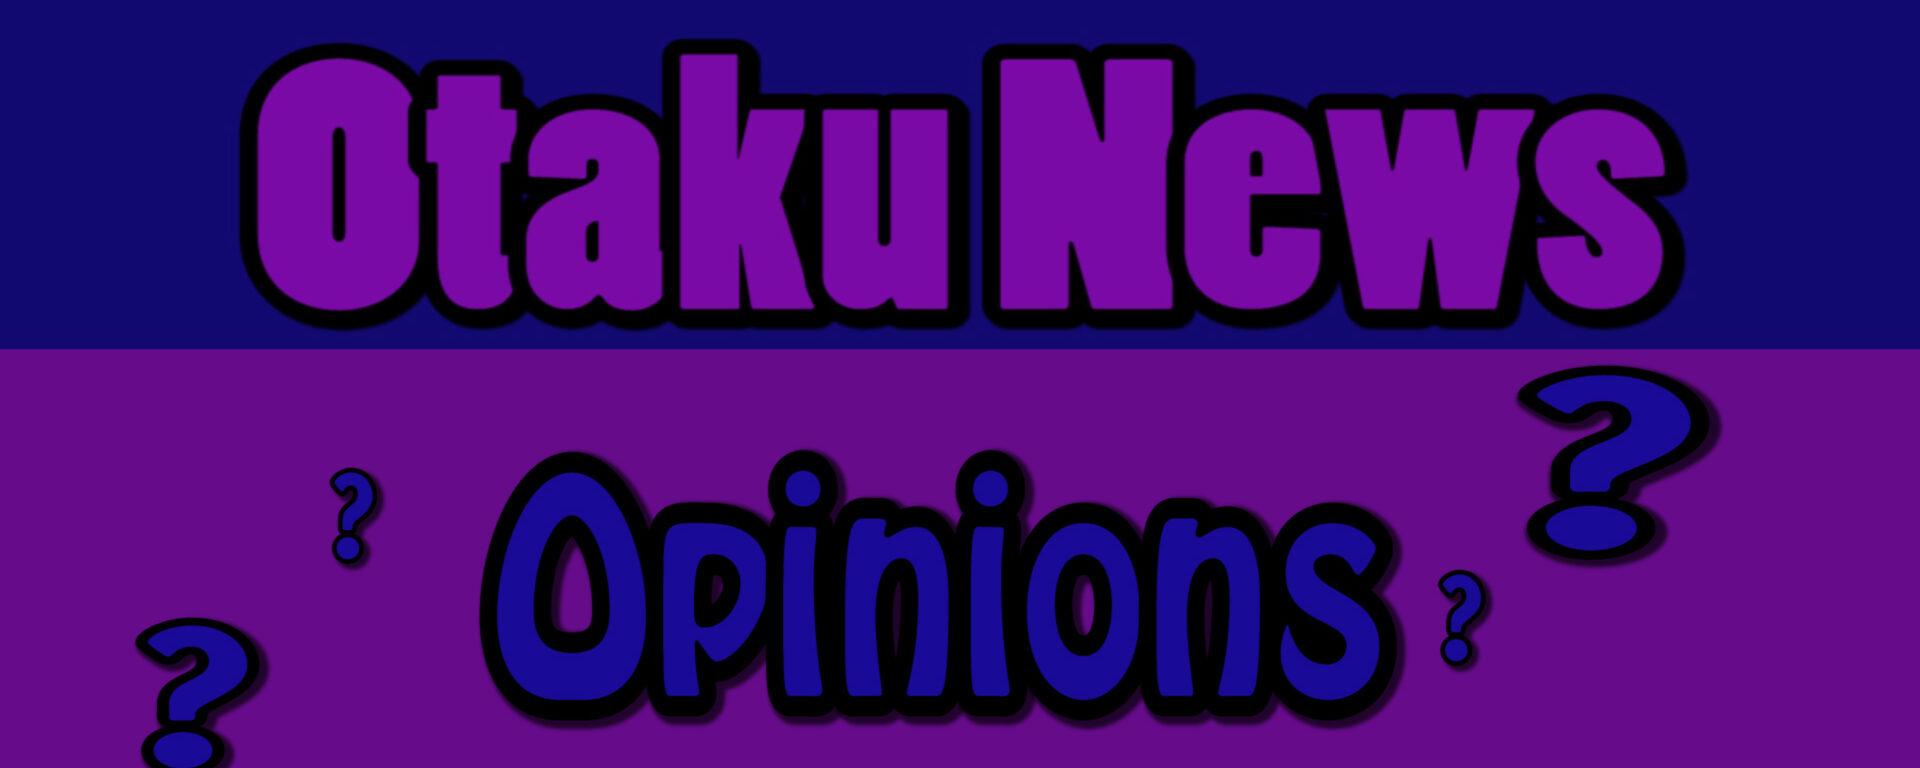 My First Manga Haul Video! Do I Still Hate Them? – Otaku News Opinions